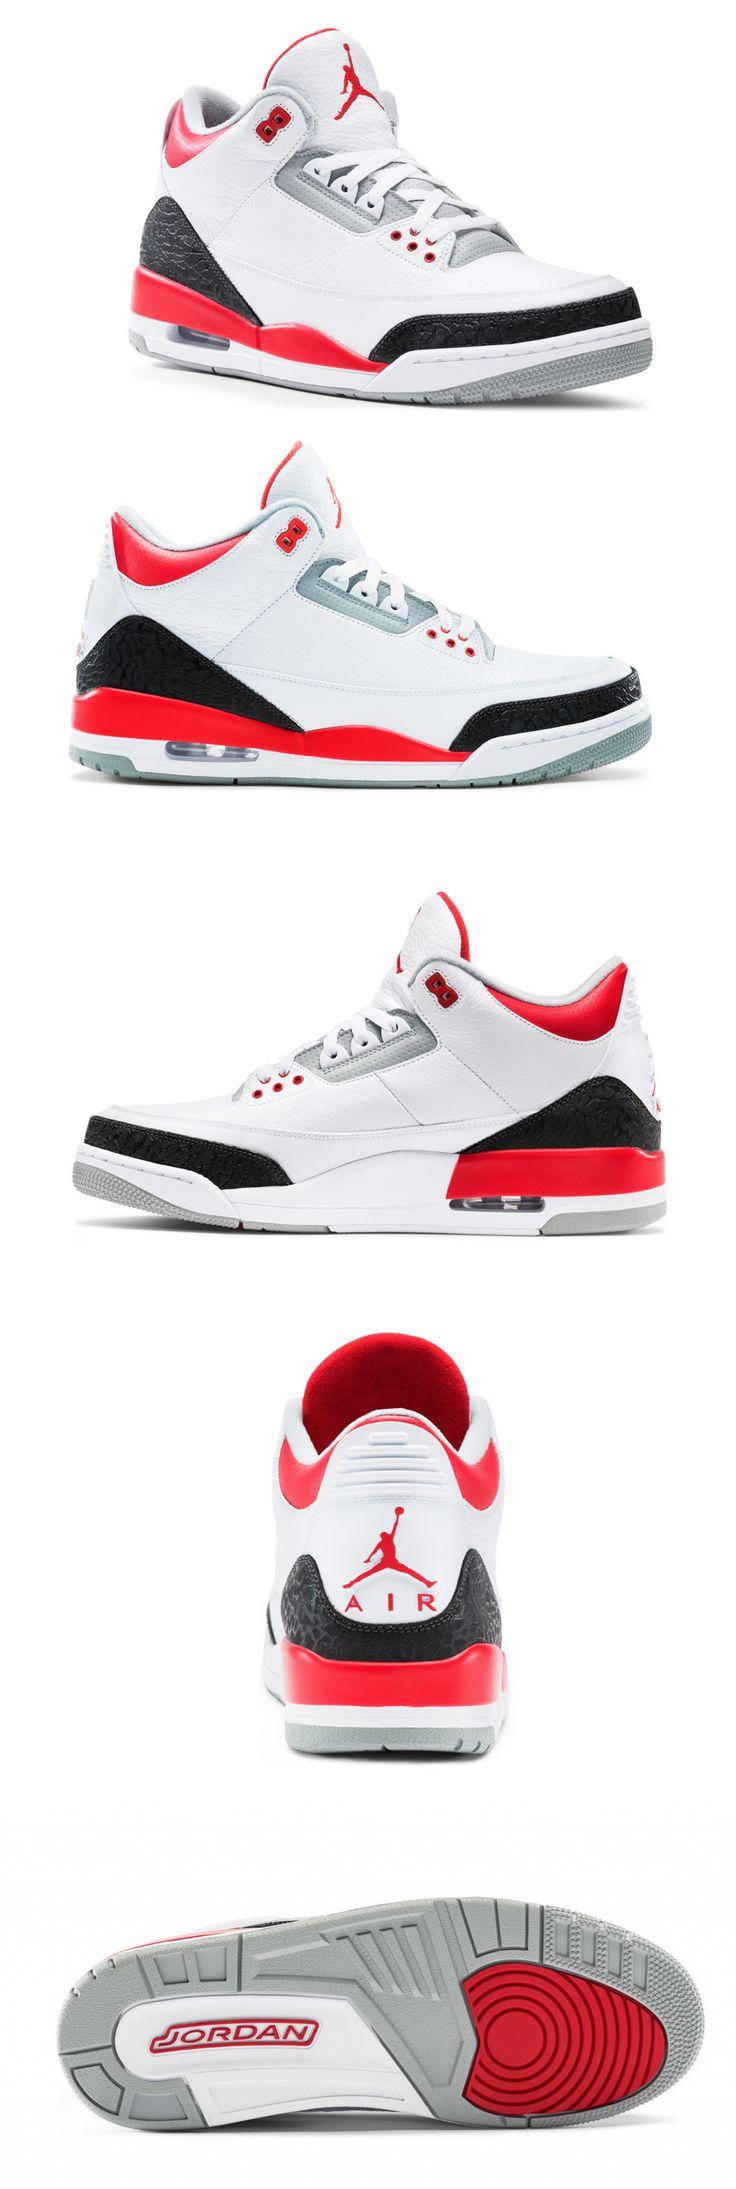 Air Jordan III - Fire Red